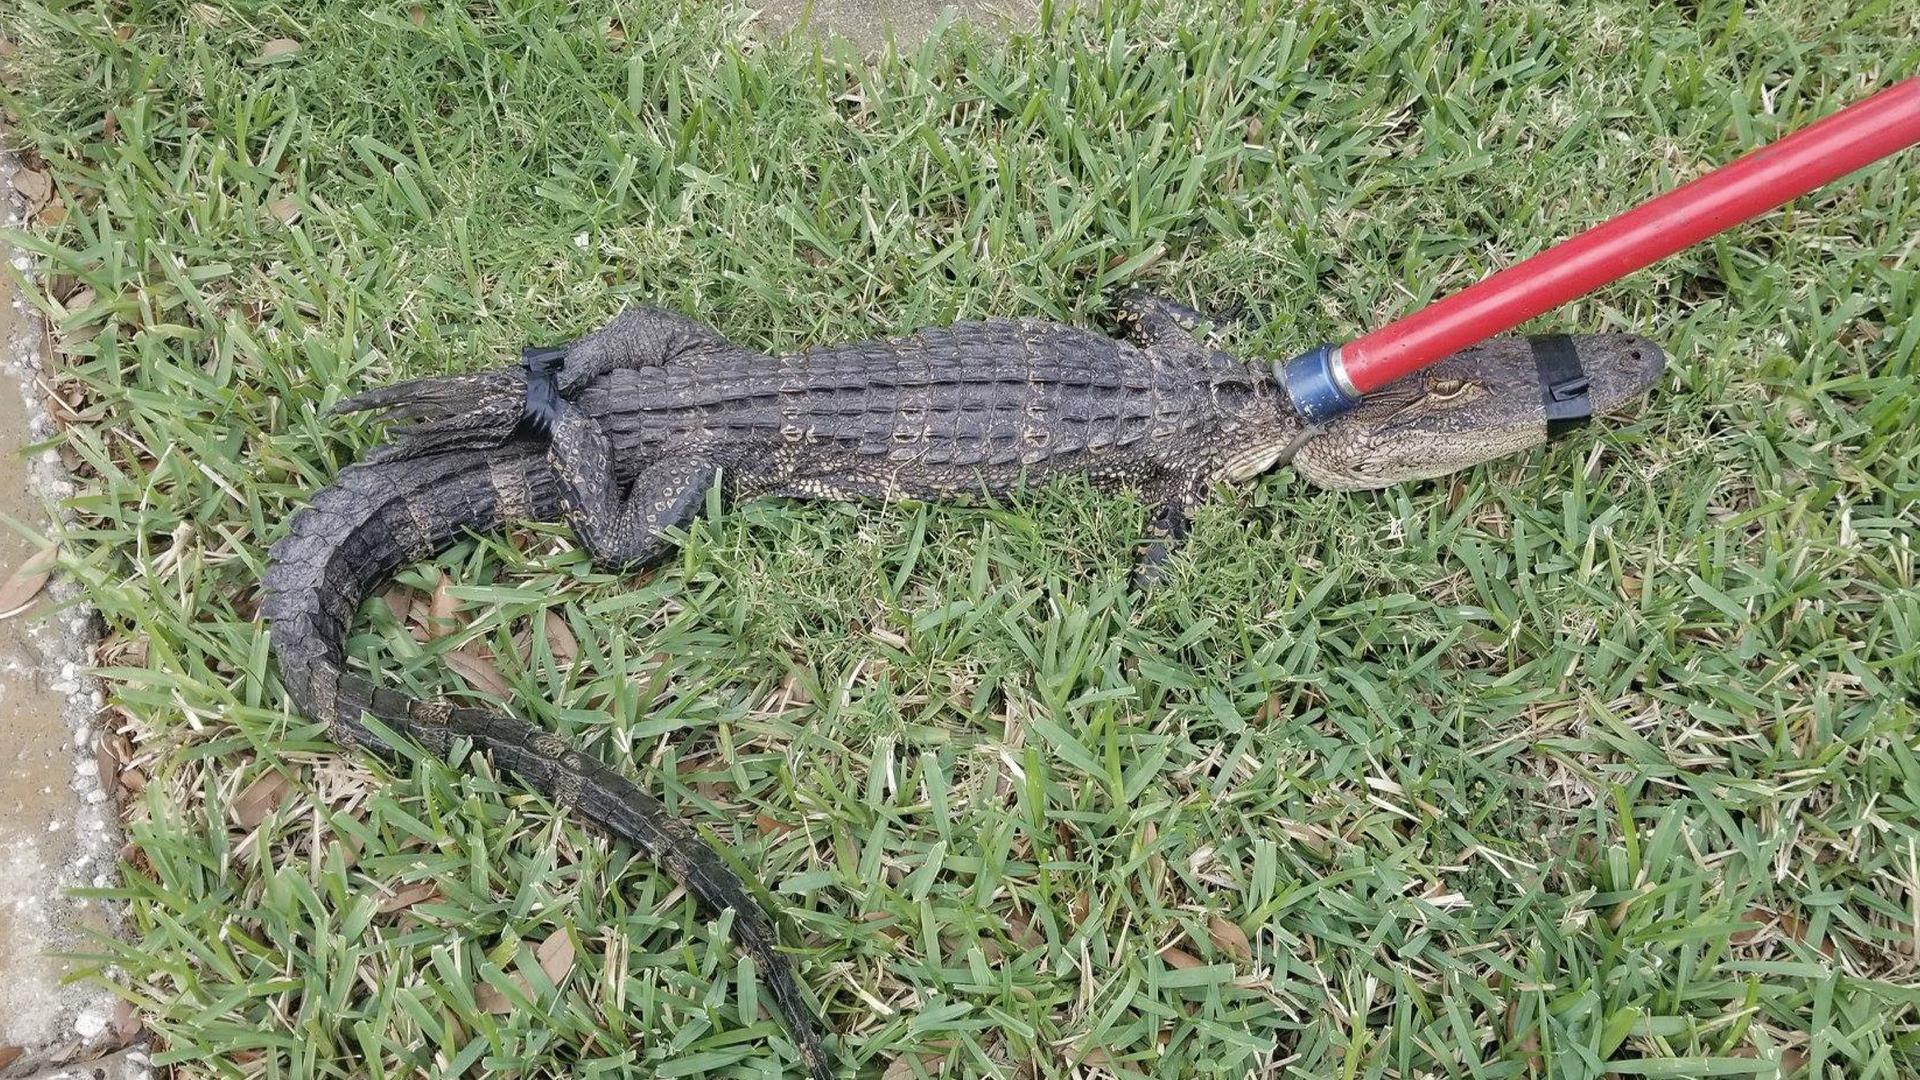 Alligator_1551803460332.jpg